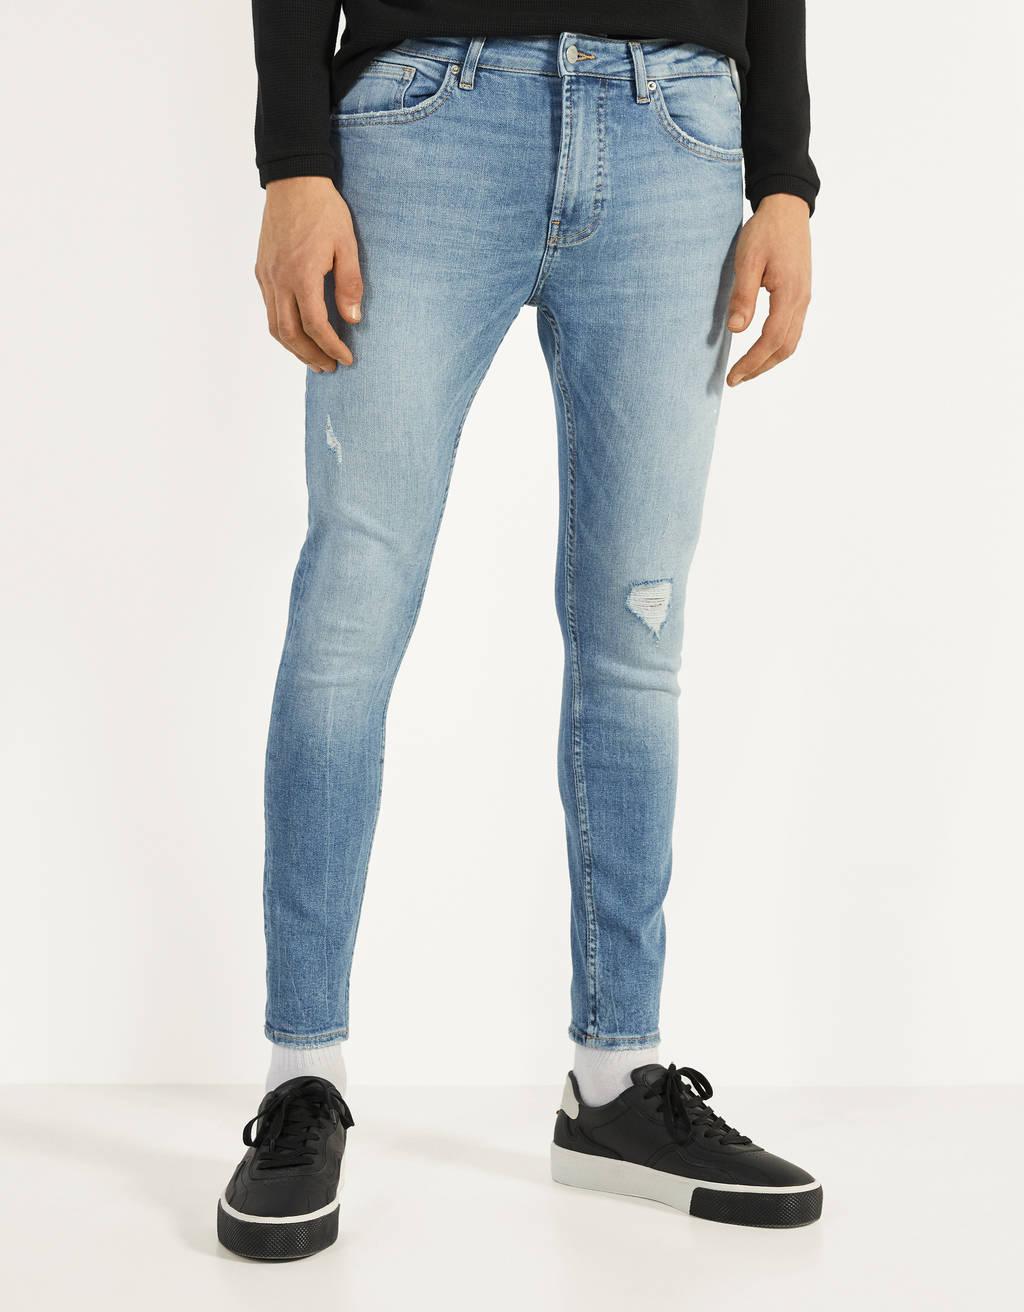 Jeans - Berschka